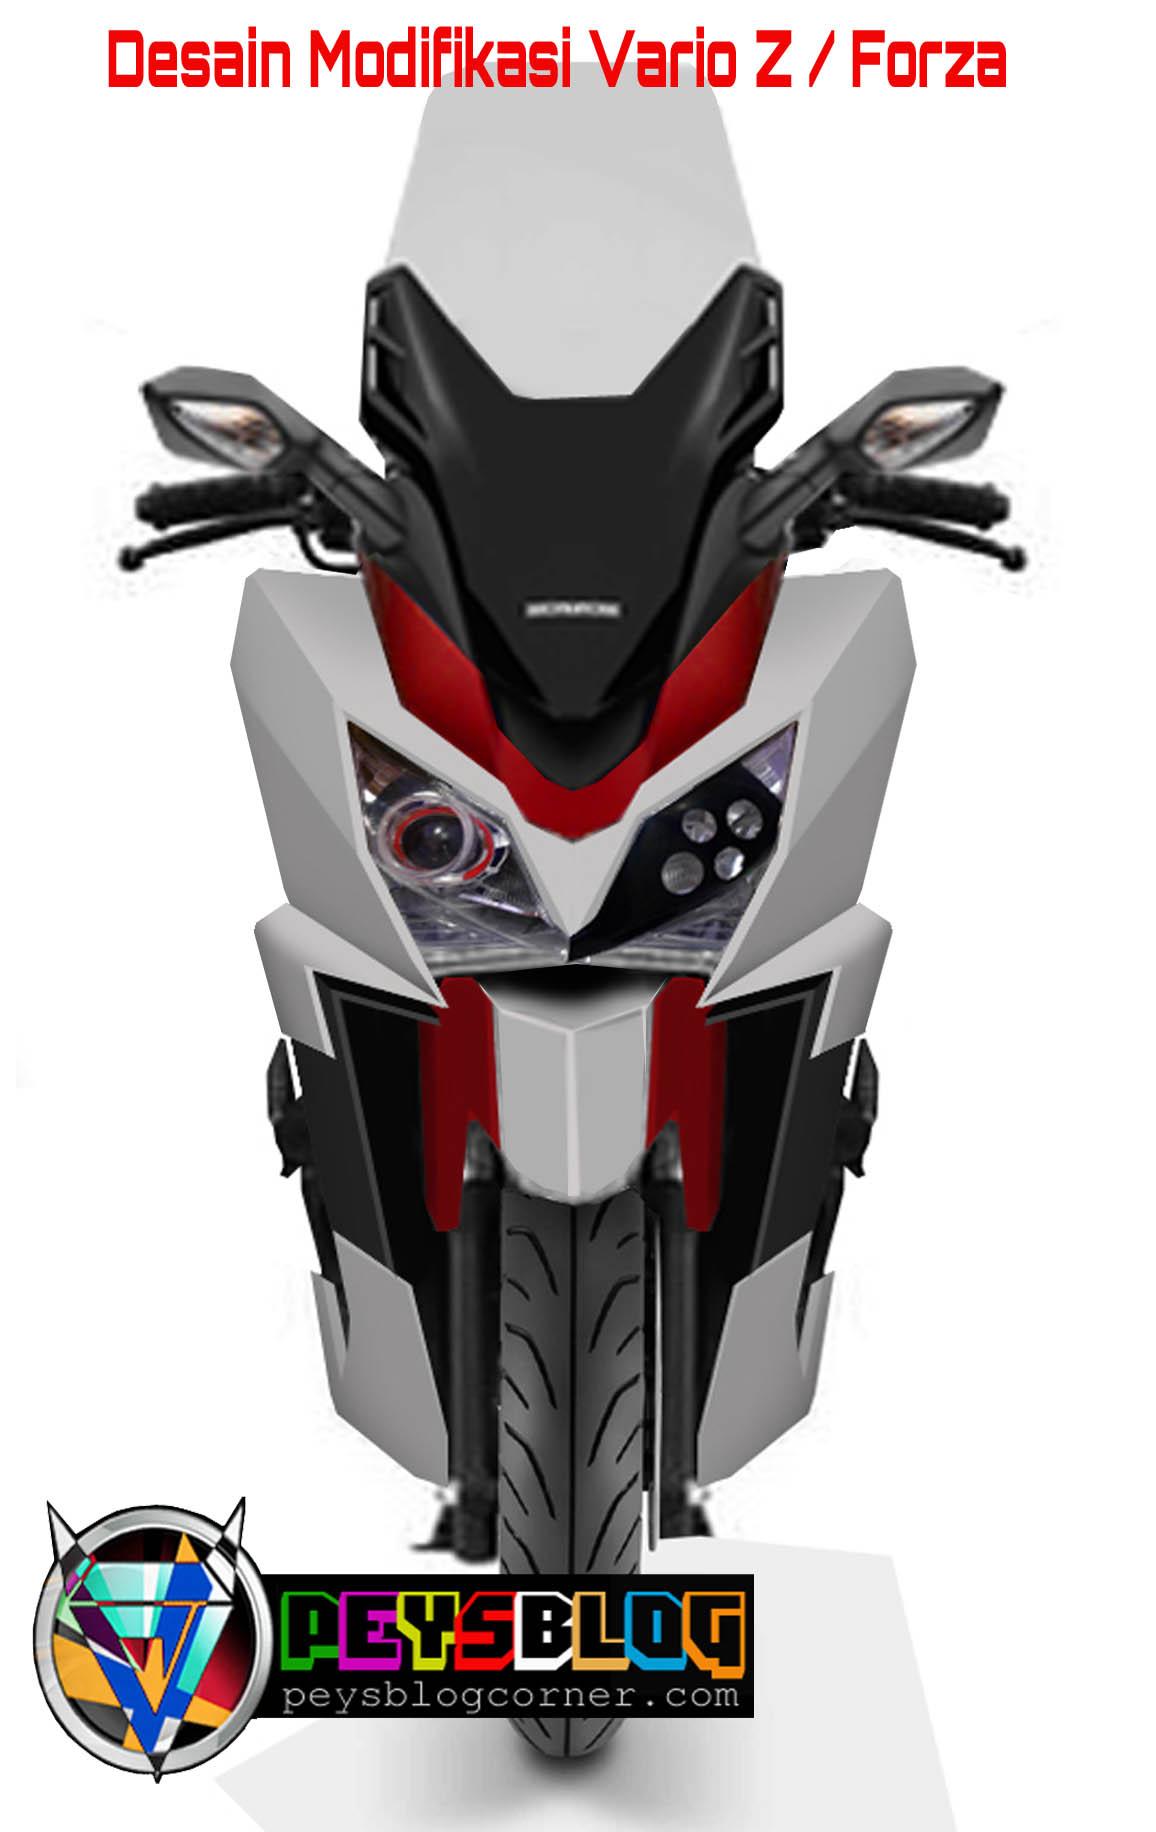 Desain Modifikasi Impian Vario 125 Jadi Honda Forza PEYSBLOG